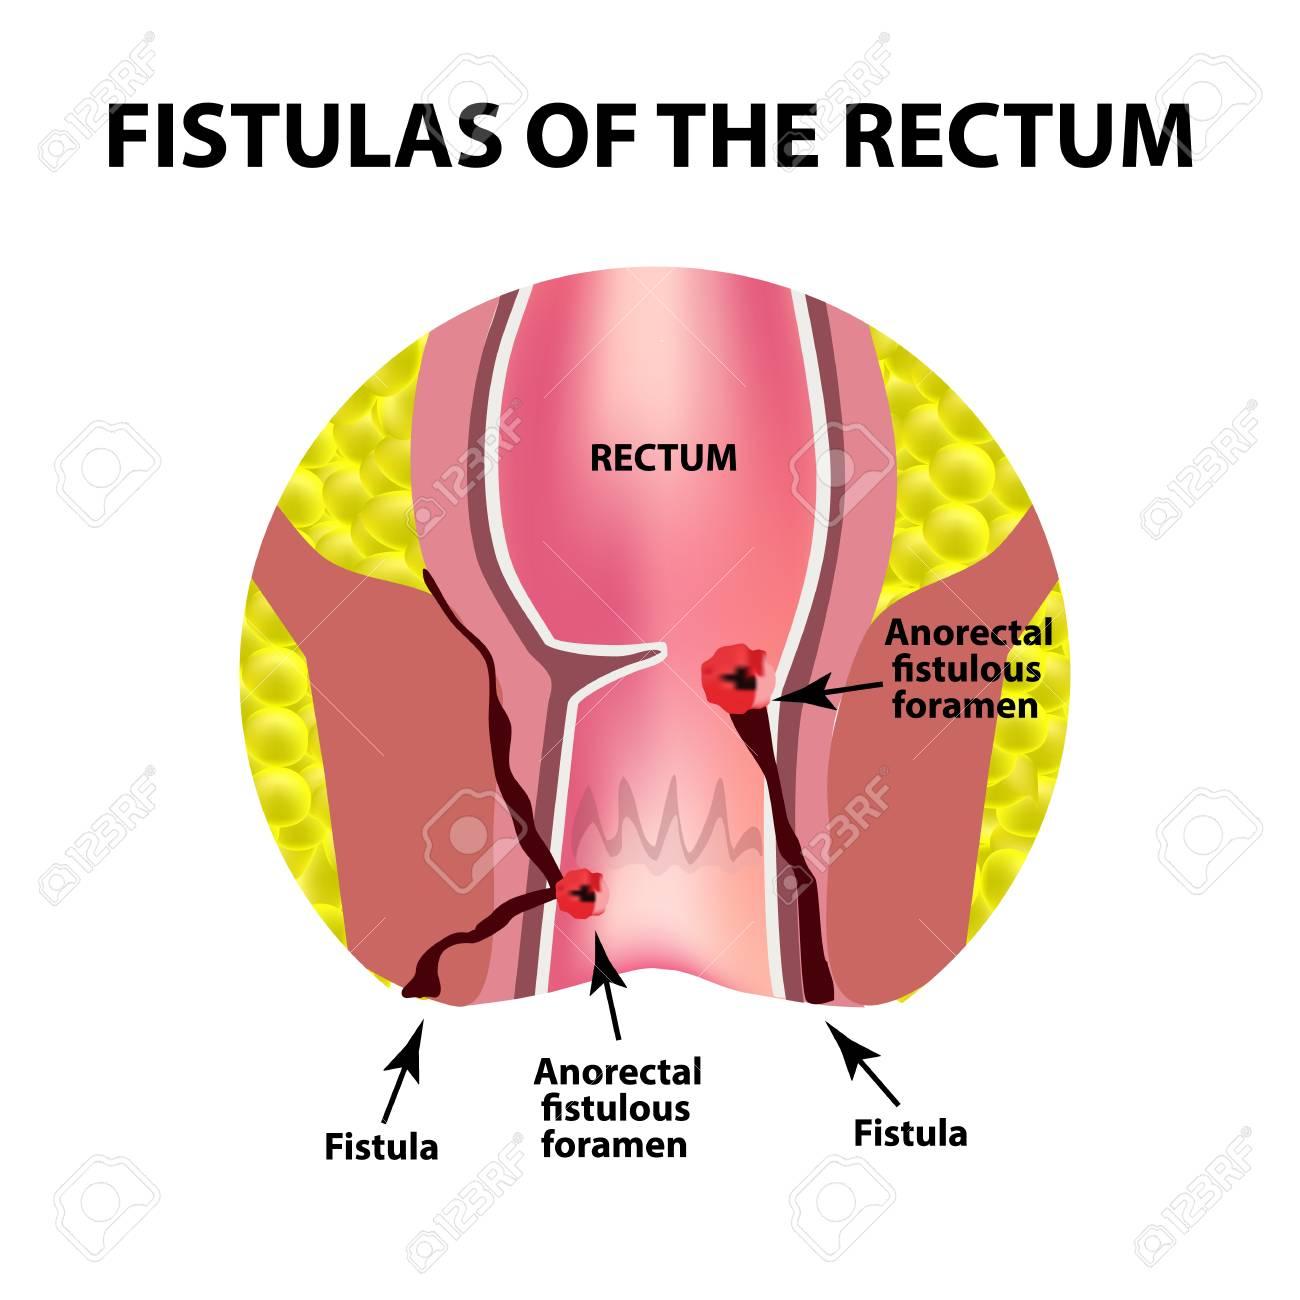 hight resolution of types of fistulas of the rectum paraproctitis anus abscess of the rectum